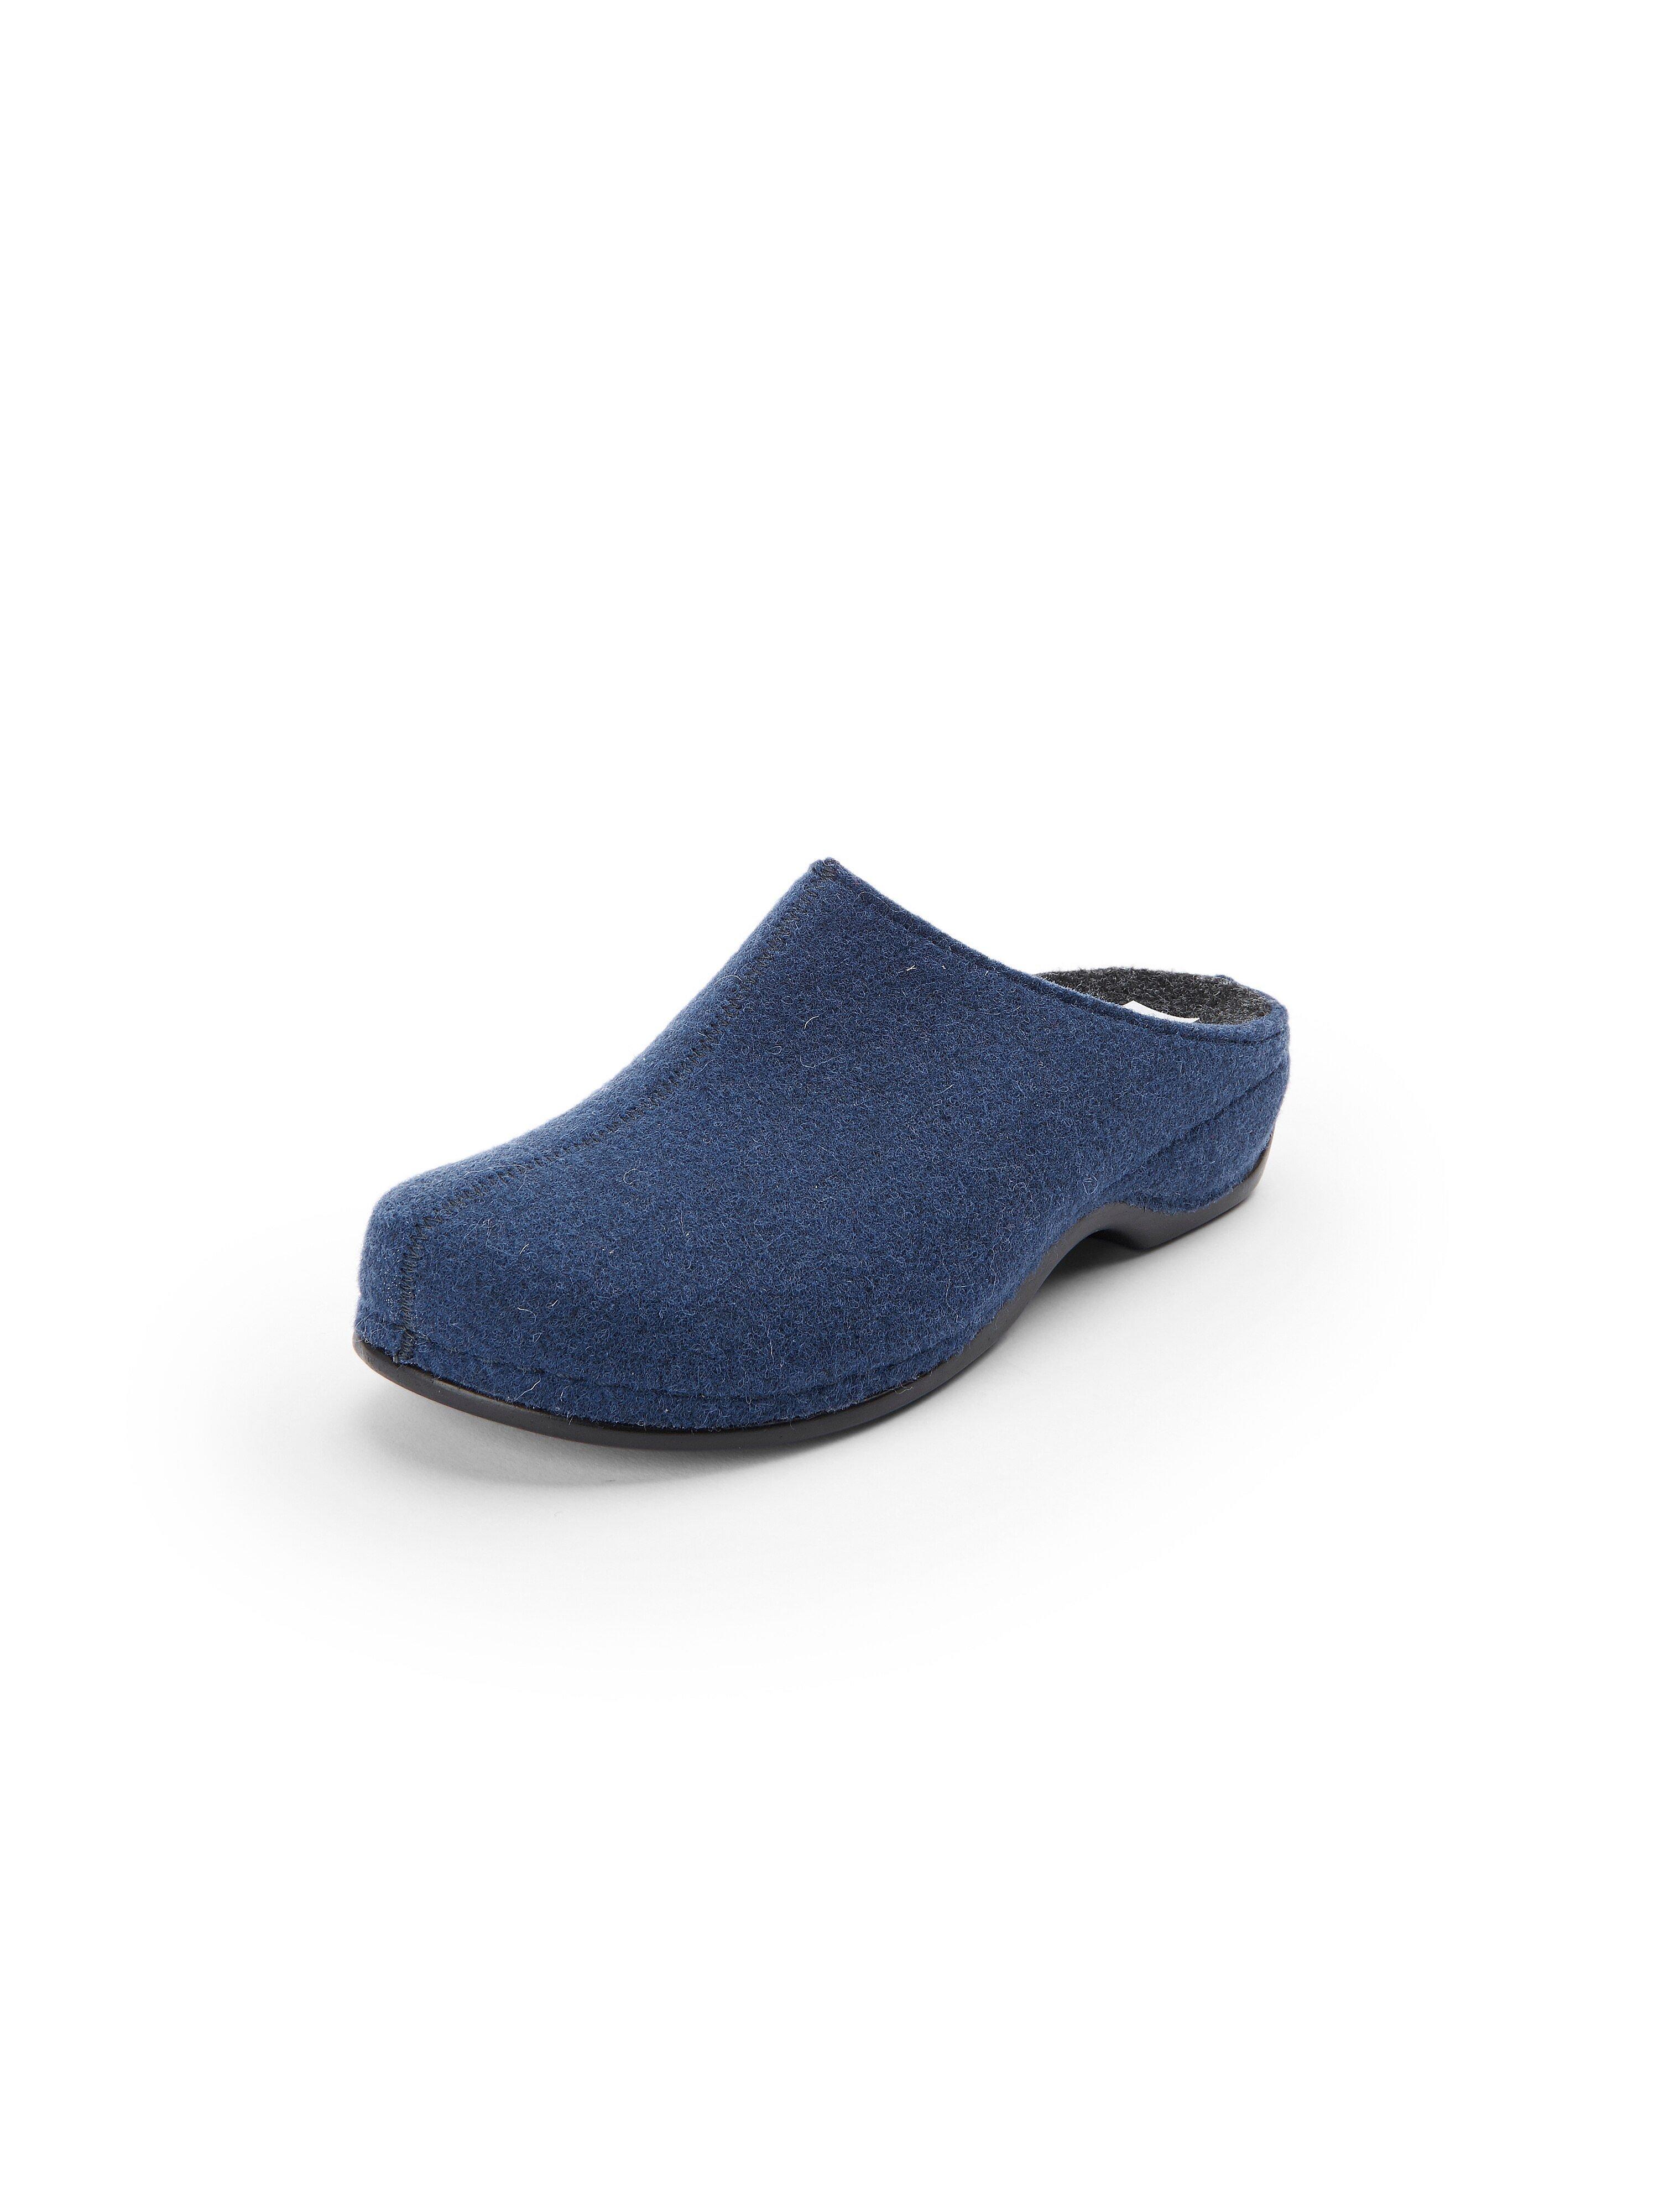 Pantoffels model Florina Van Berkemann Original blauw